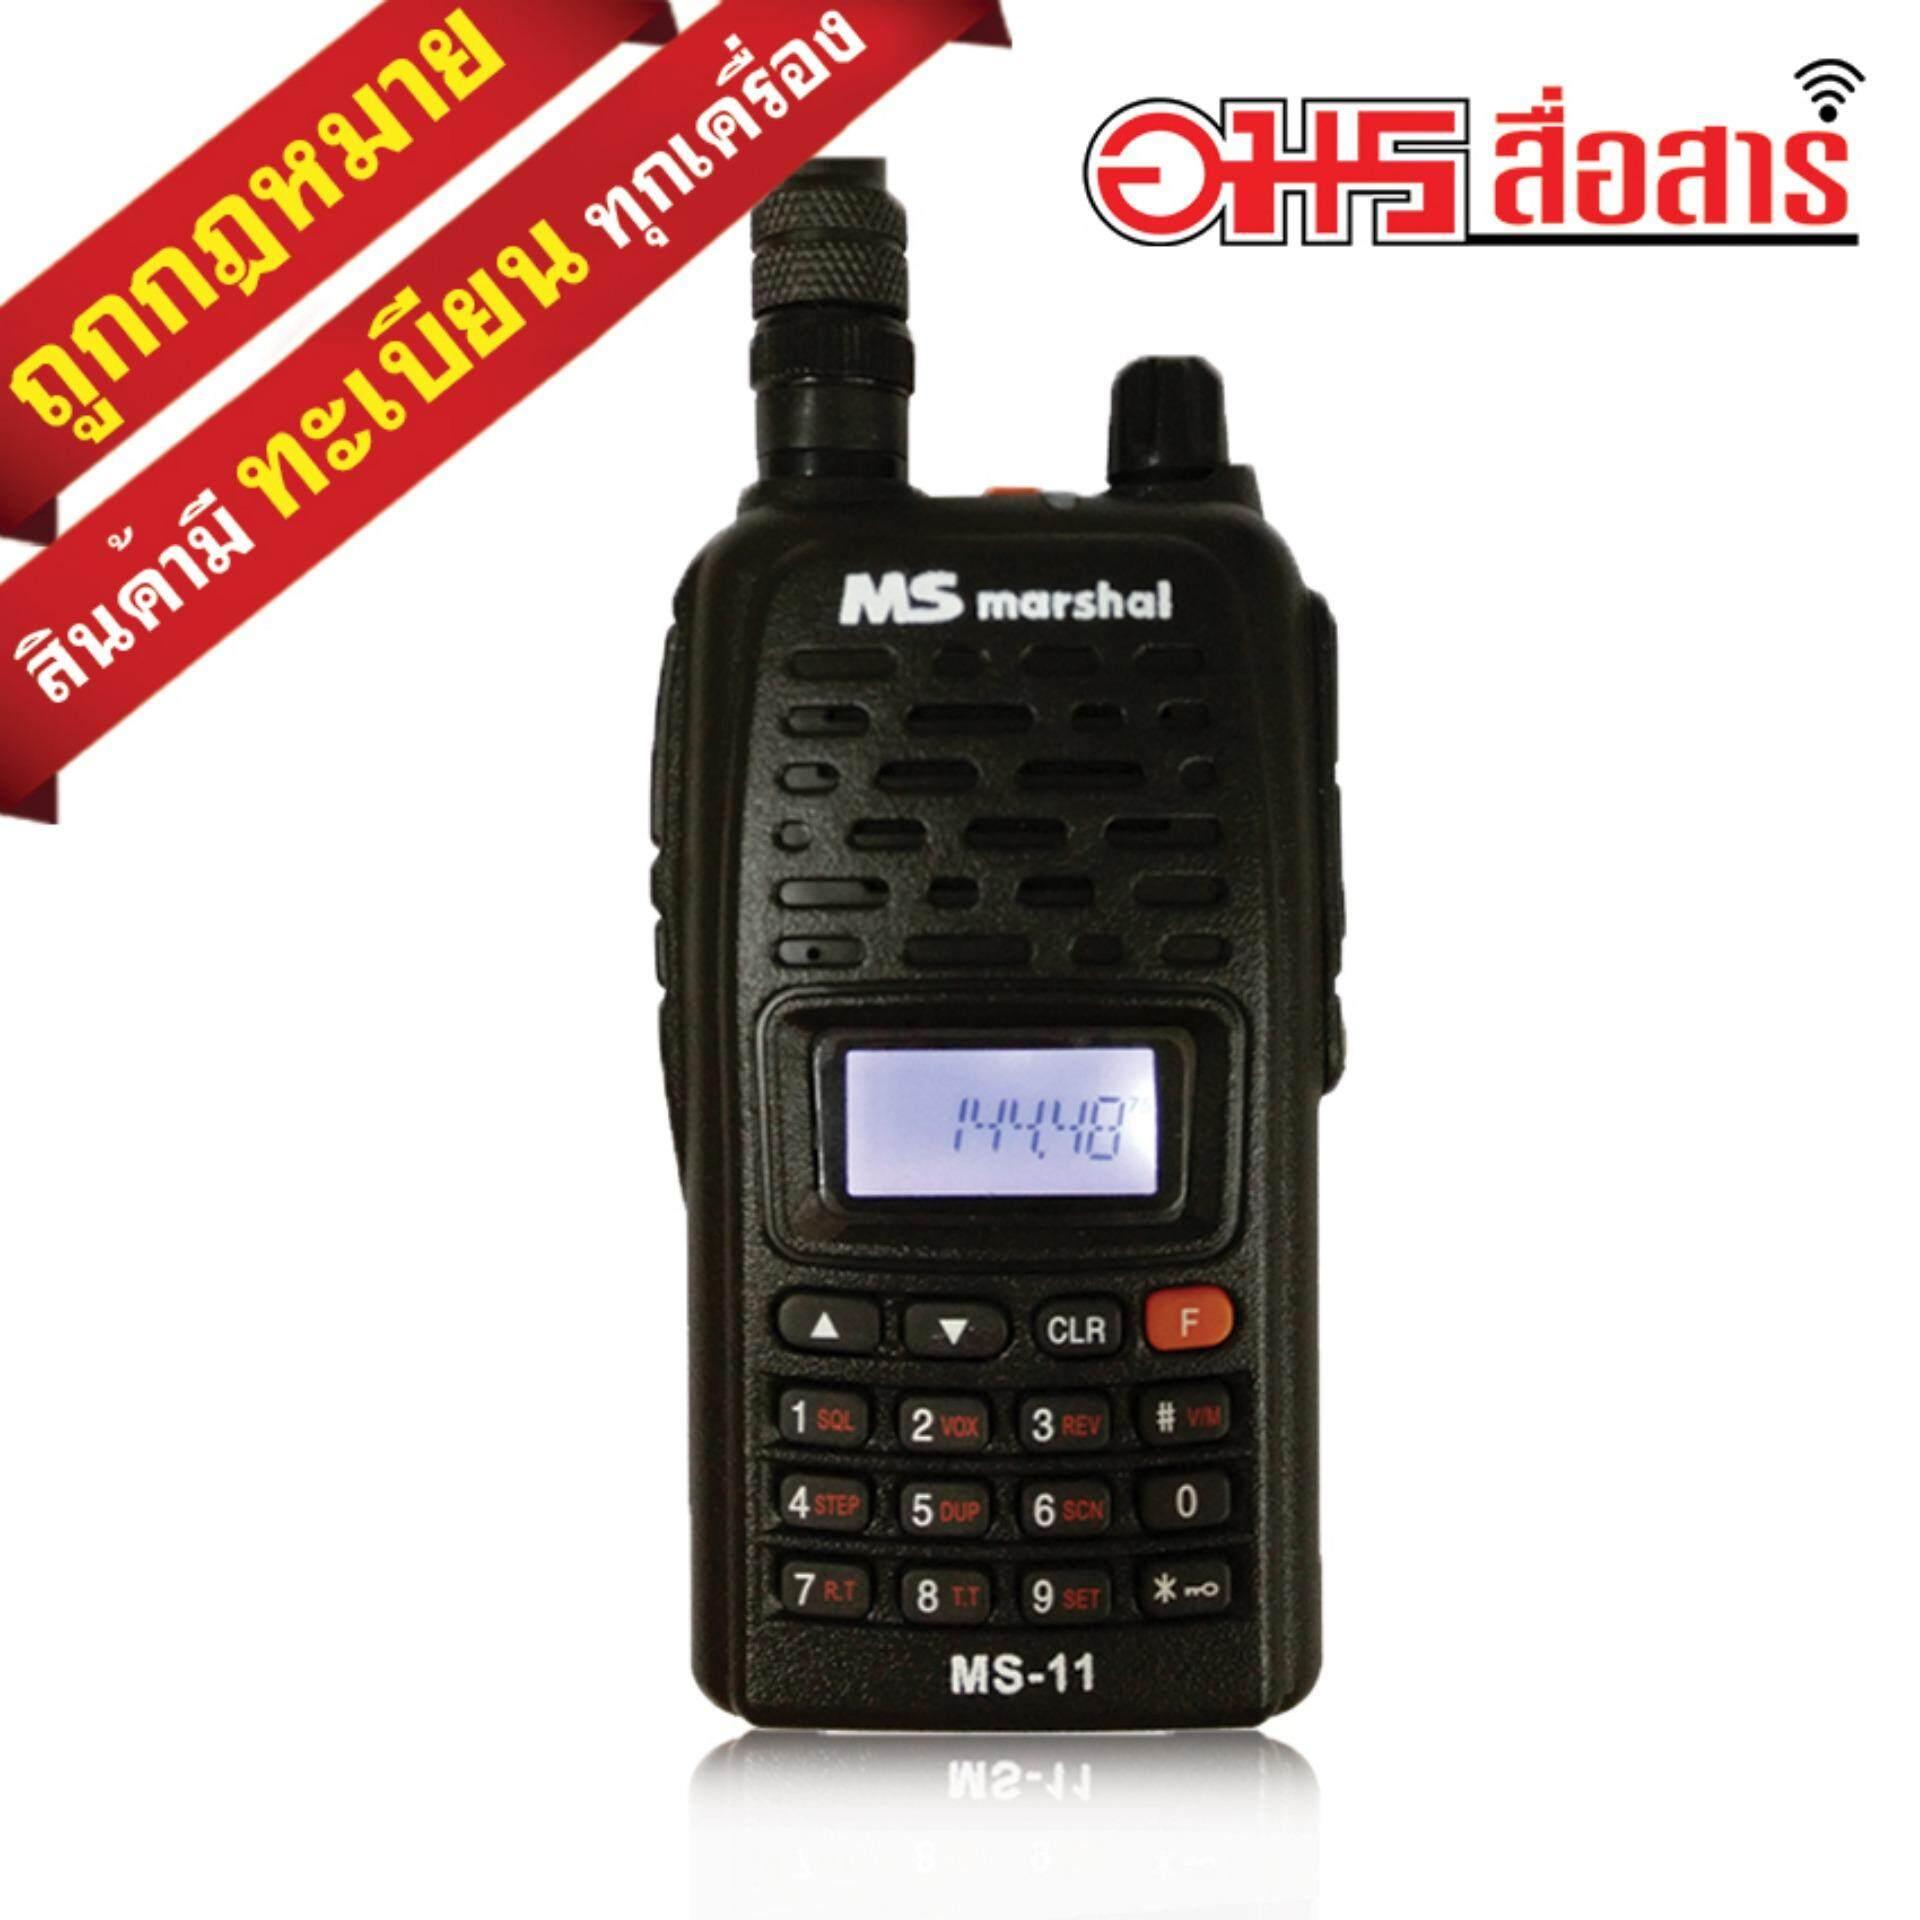 MS MARSHAL วิทยุสื่อสาร 5W รุ่น MS-11 สีดำ WALKIE TALKIE walkie-talkie